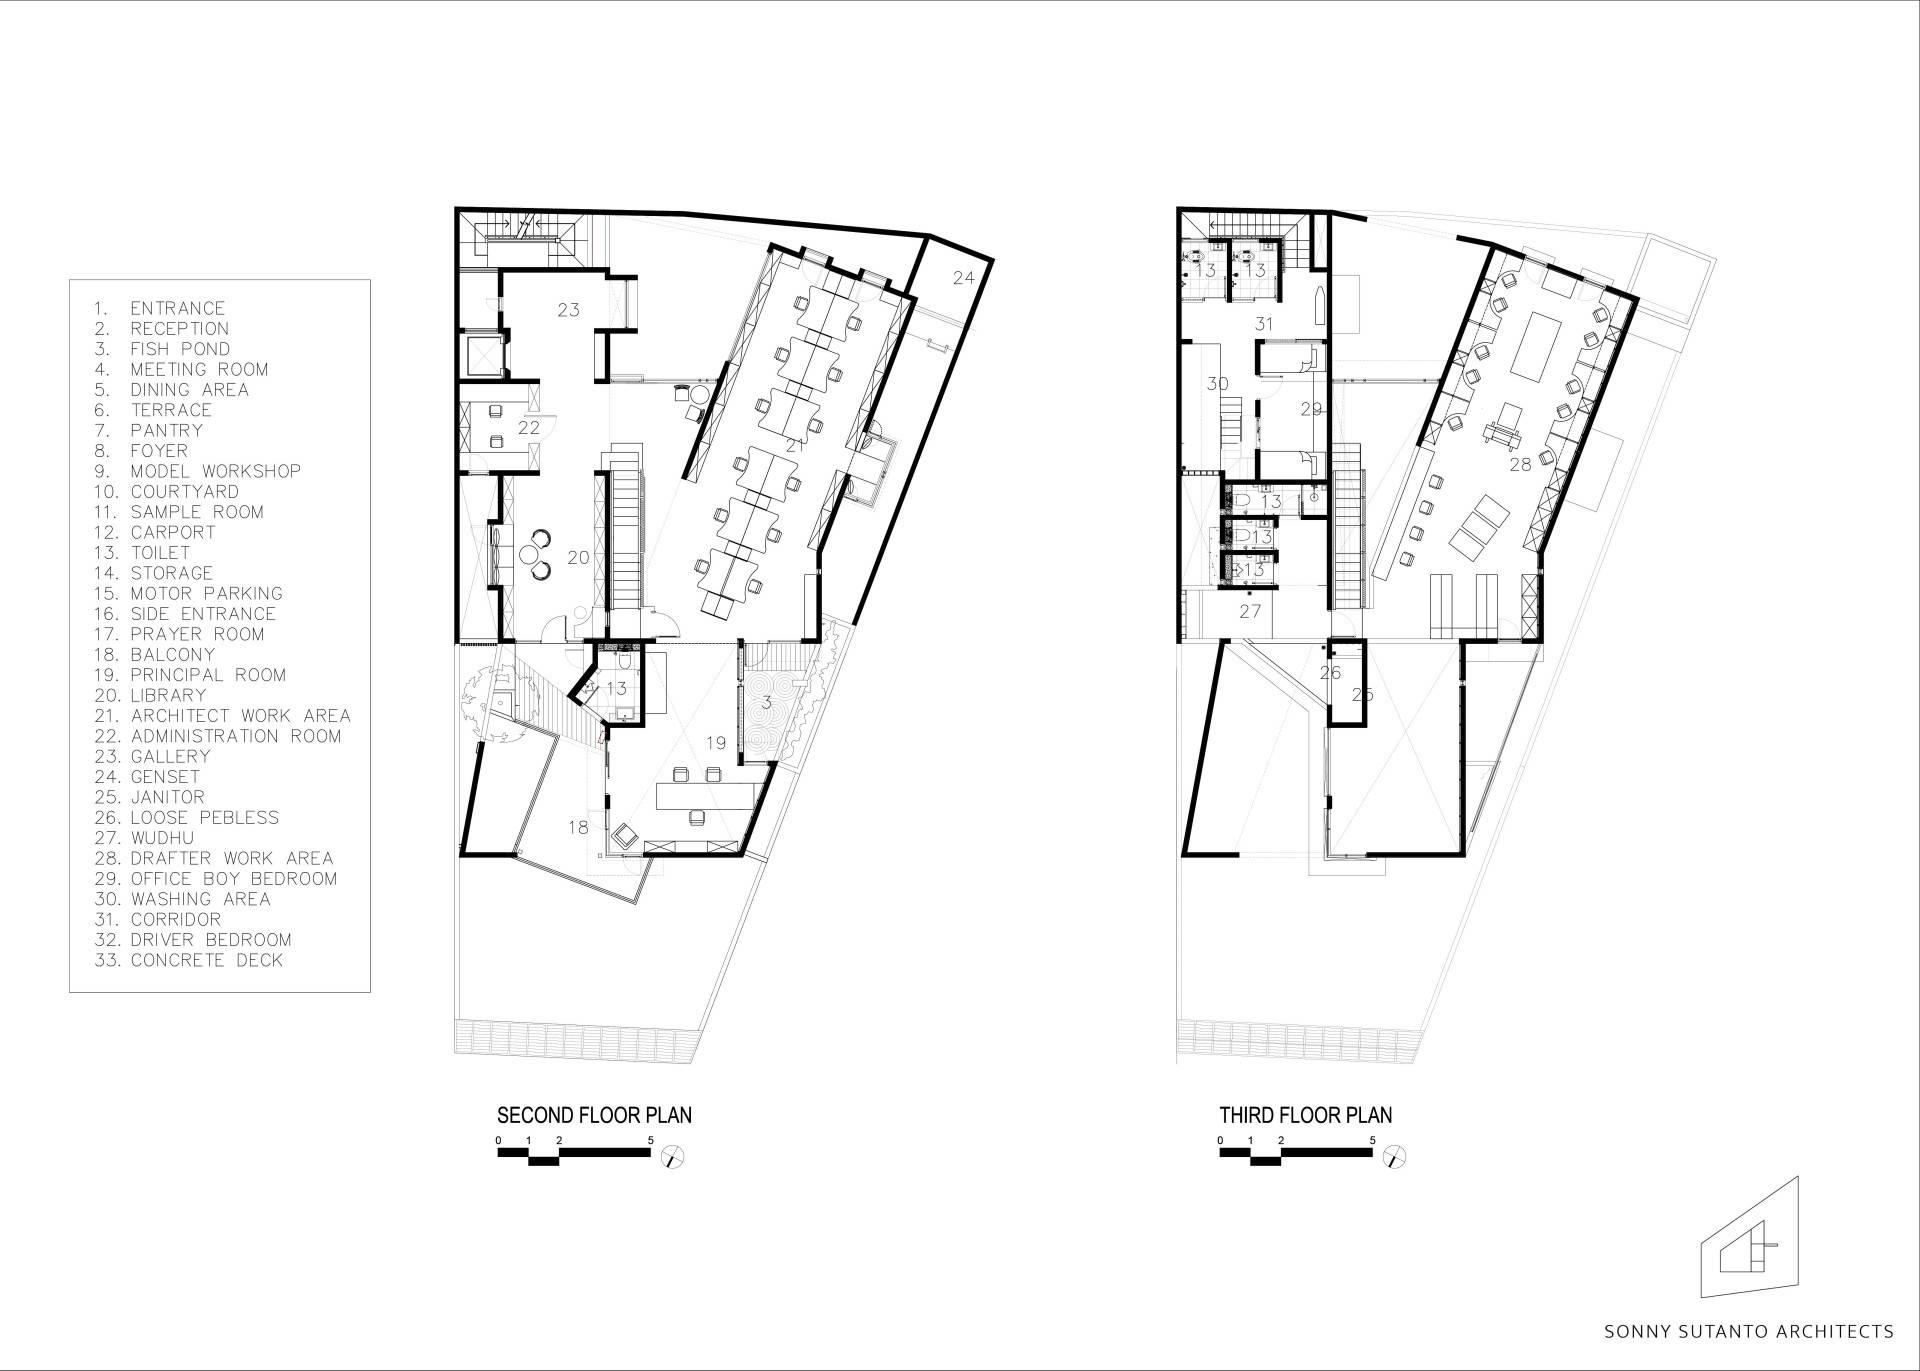 Sonny Sutanto Architects Sonny Sutanto Architects New Office Sunter, North Jakarta, Indonesia Sunter, North Jakarta, Indonesia 2Nd And 3Rd Floor Plan   2088